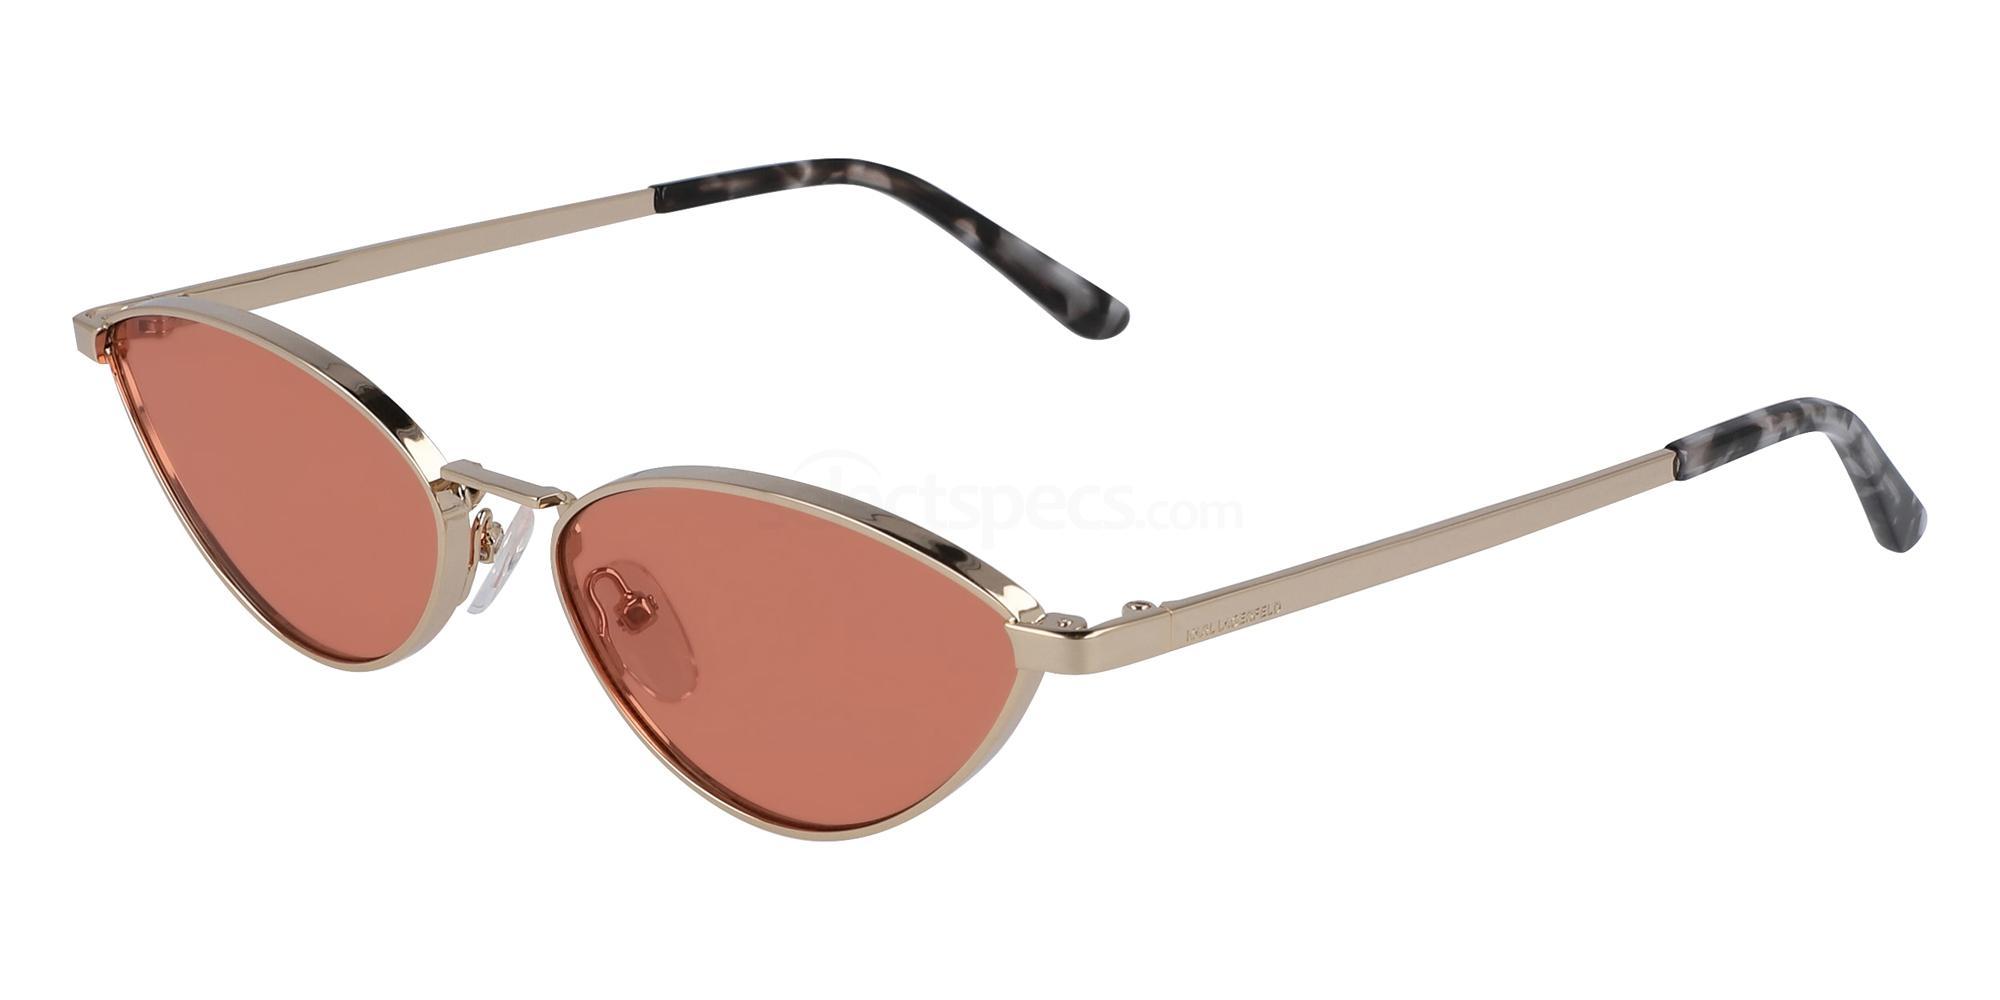 Karl Lagerfeld KL312S skinny sunglasses